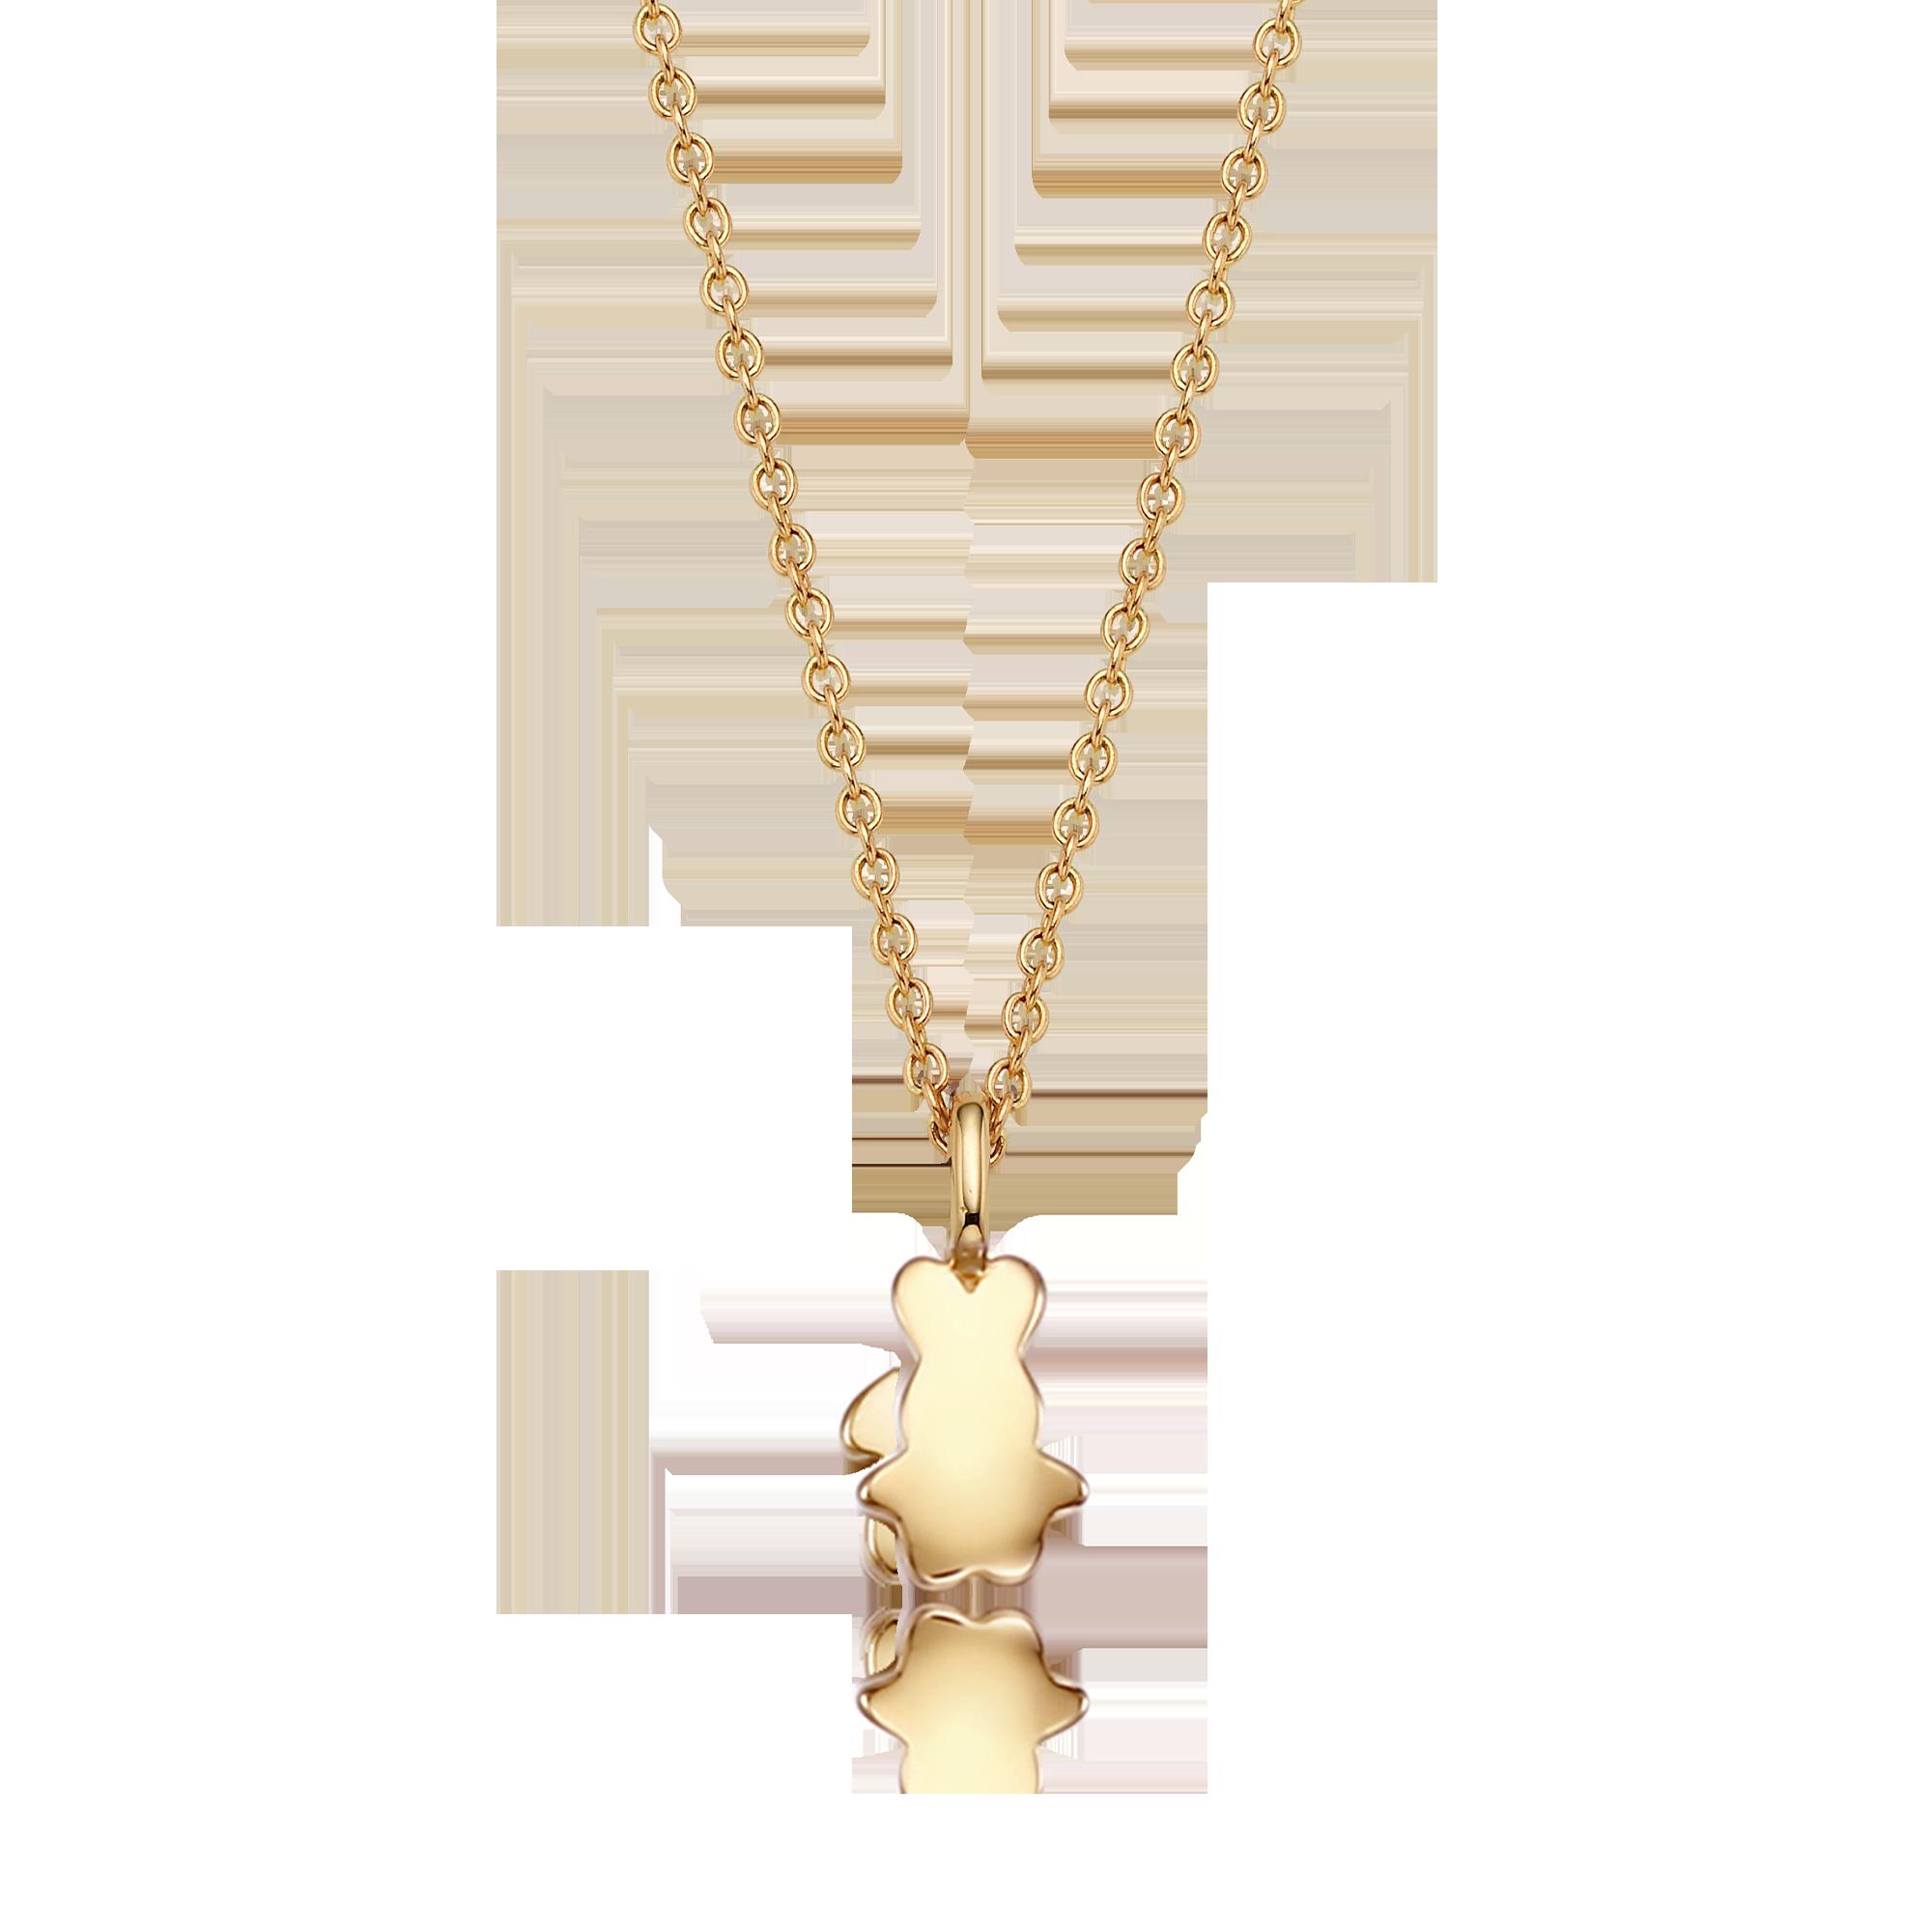 14K/18K Gold Mini Zodiac Rabbit - My Guardian Animal Necklace